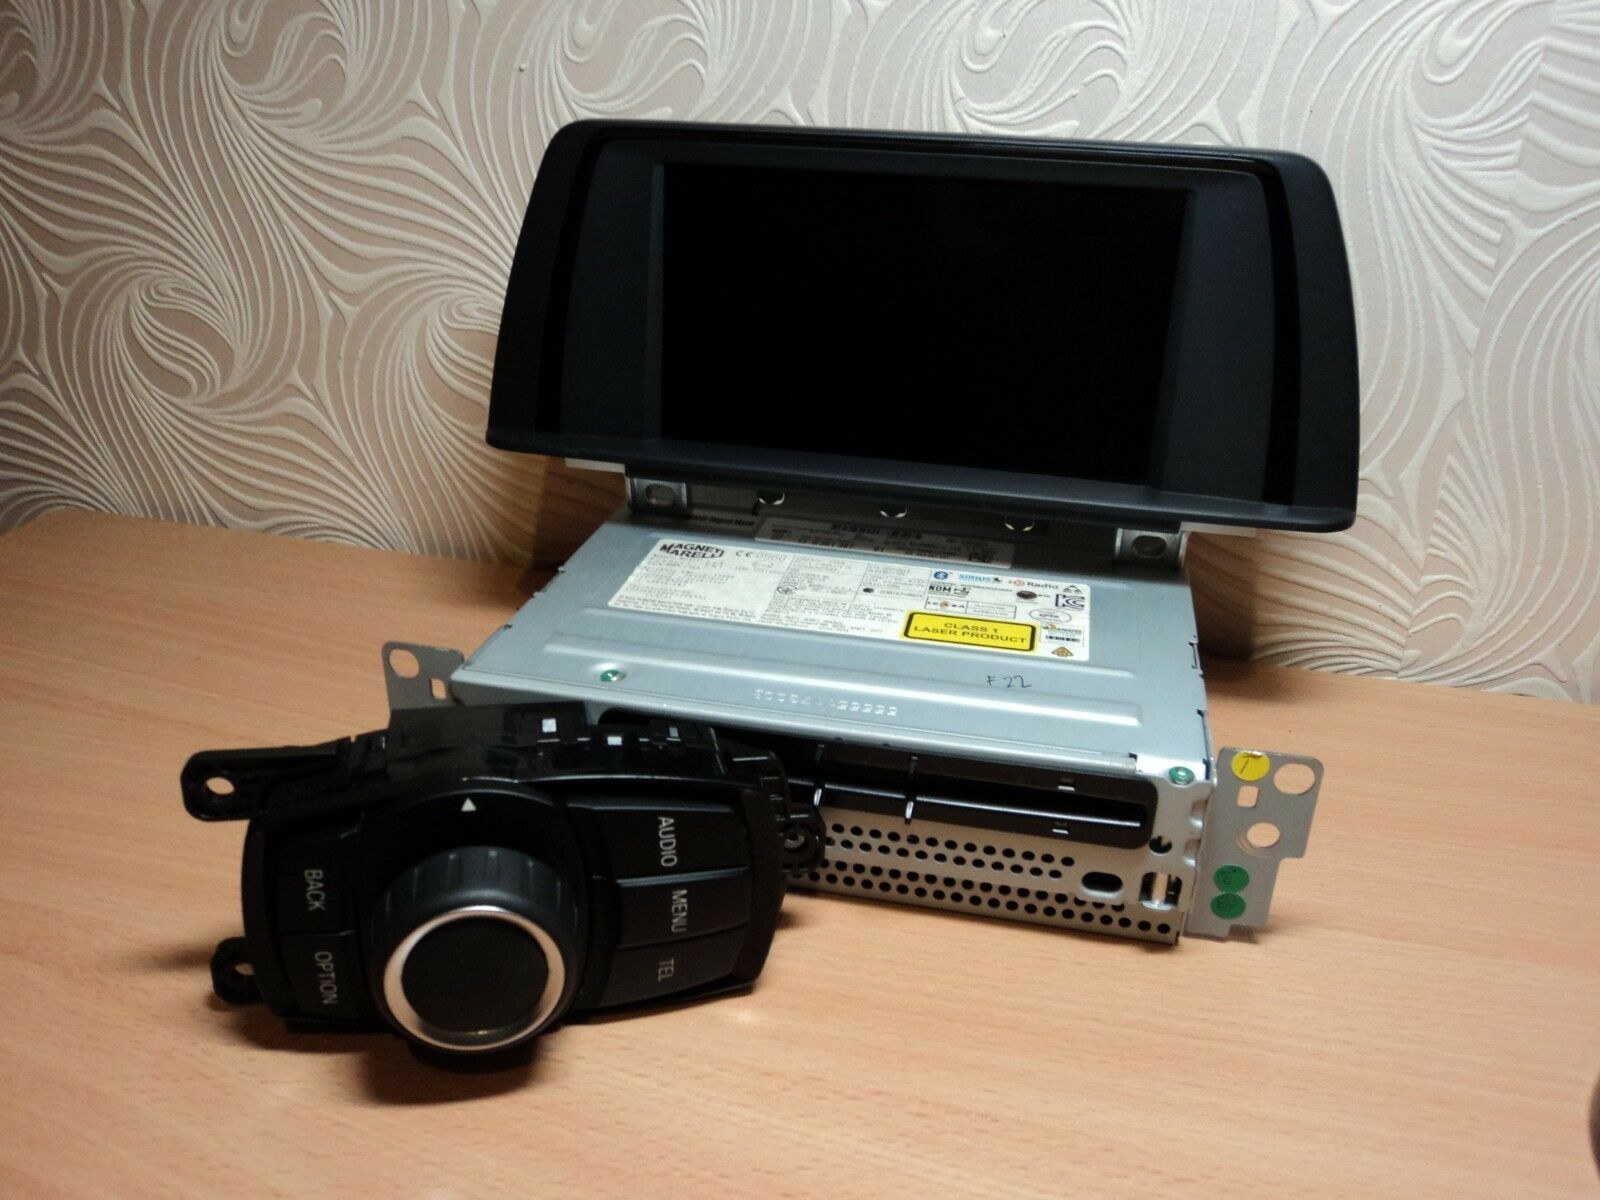 BMW F20 F21 F22 F23 Radio Professional CD Display Controler Set 9381307 9270391